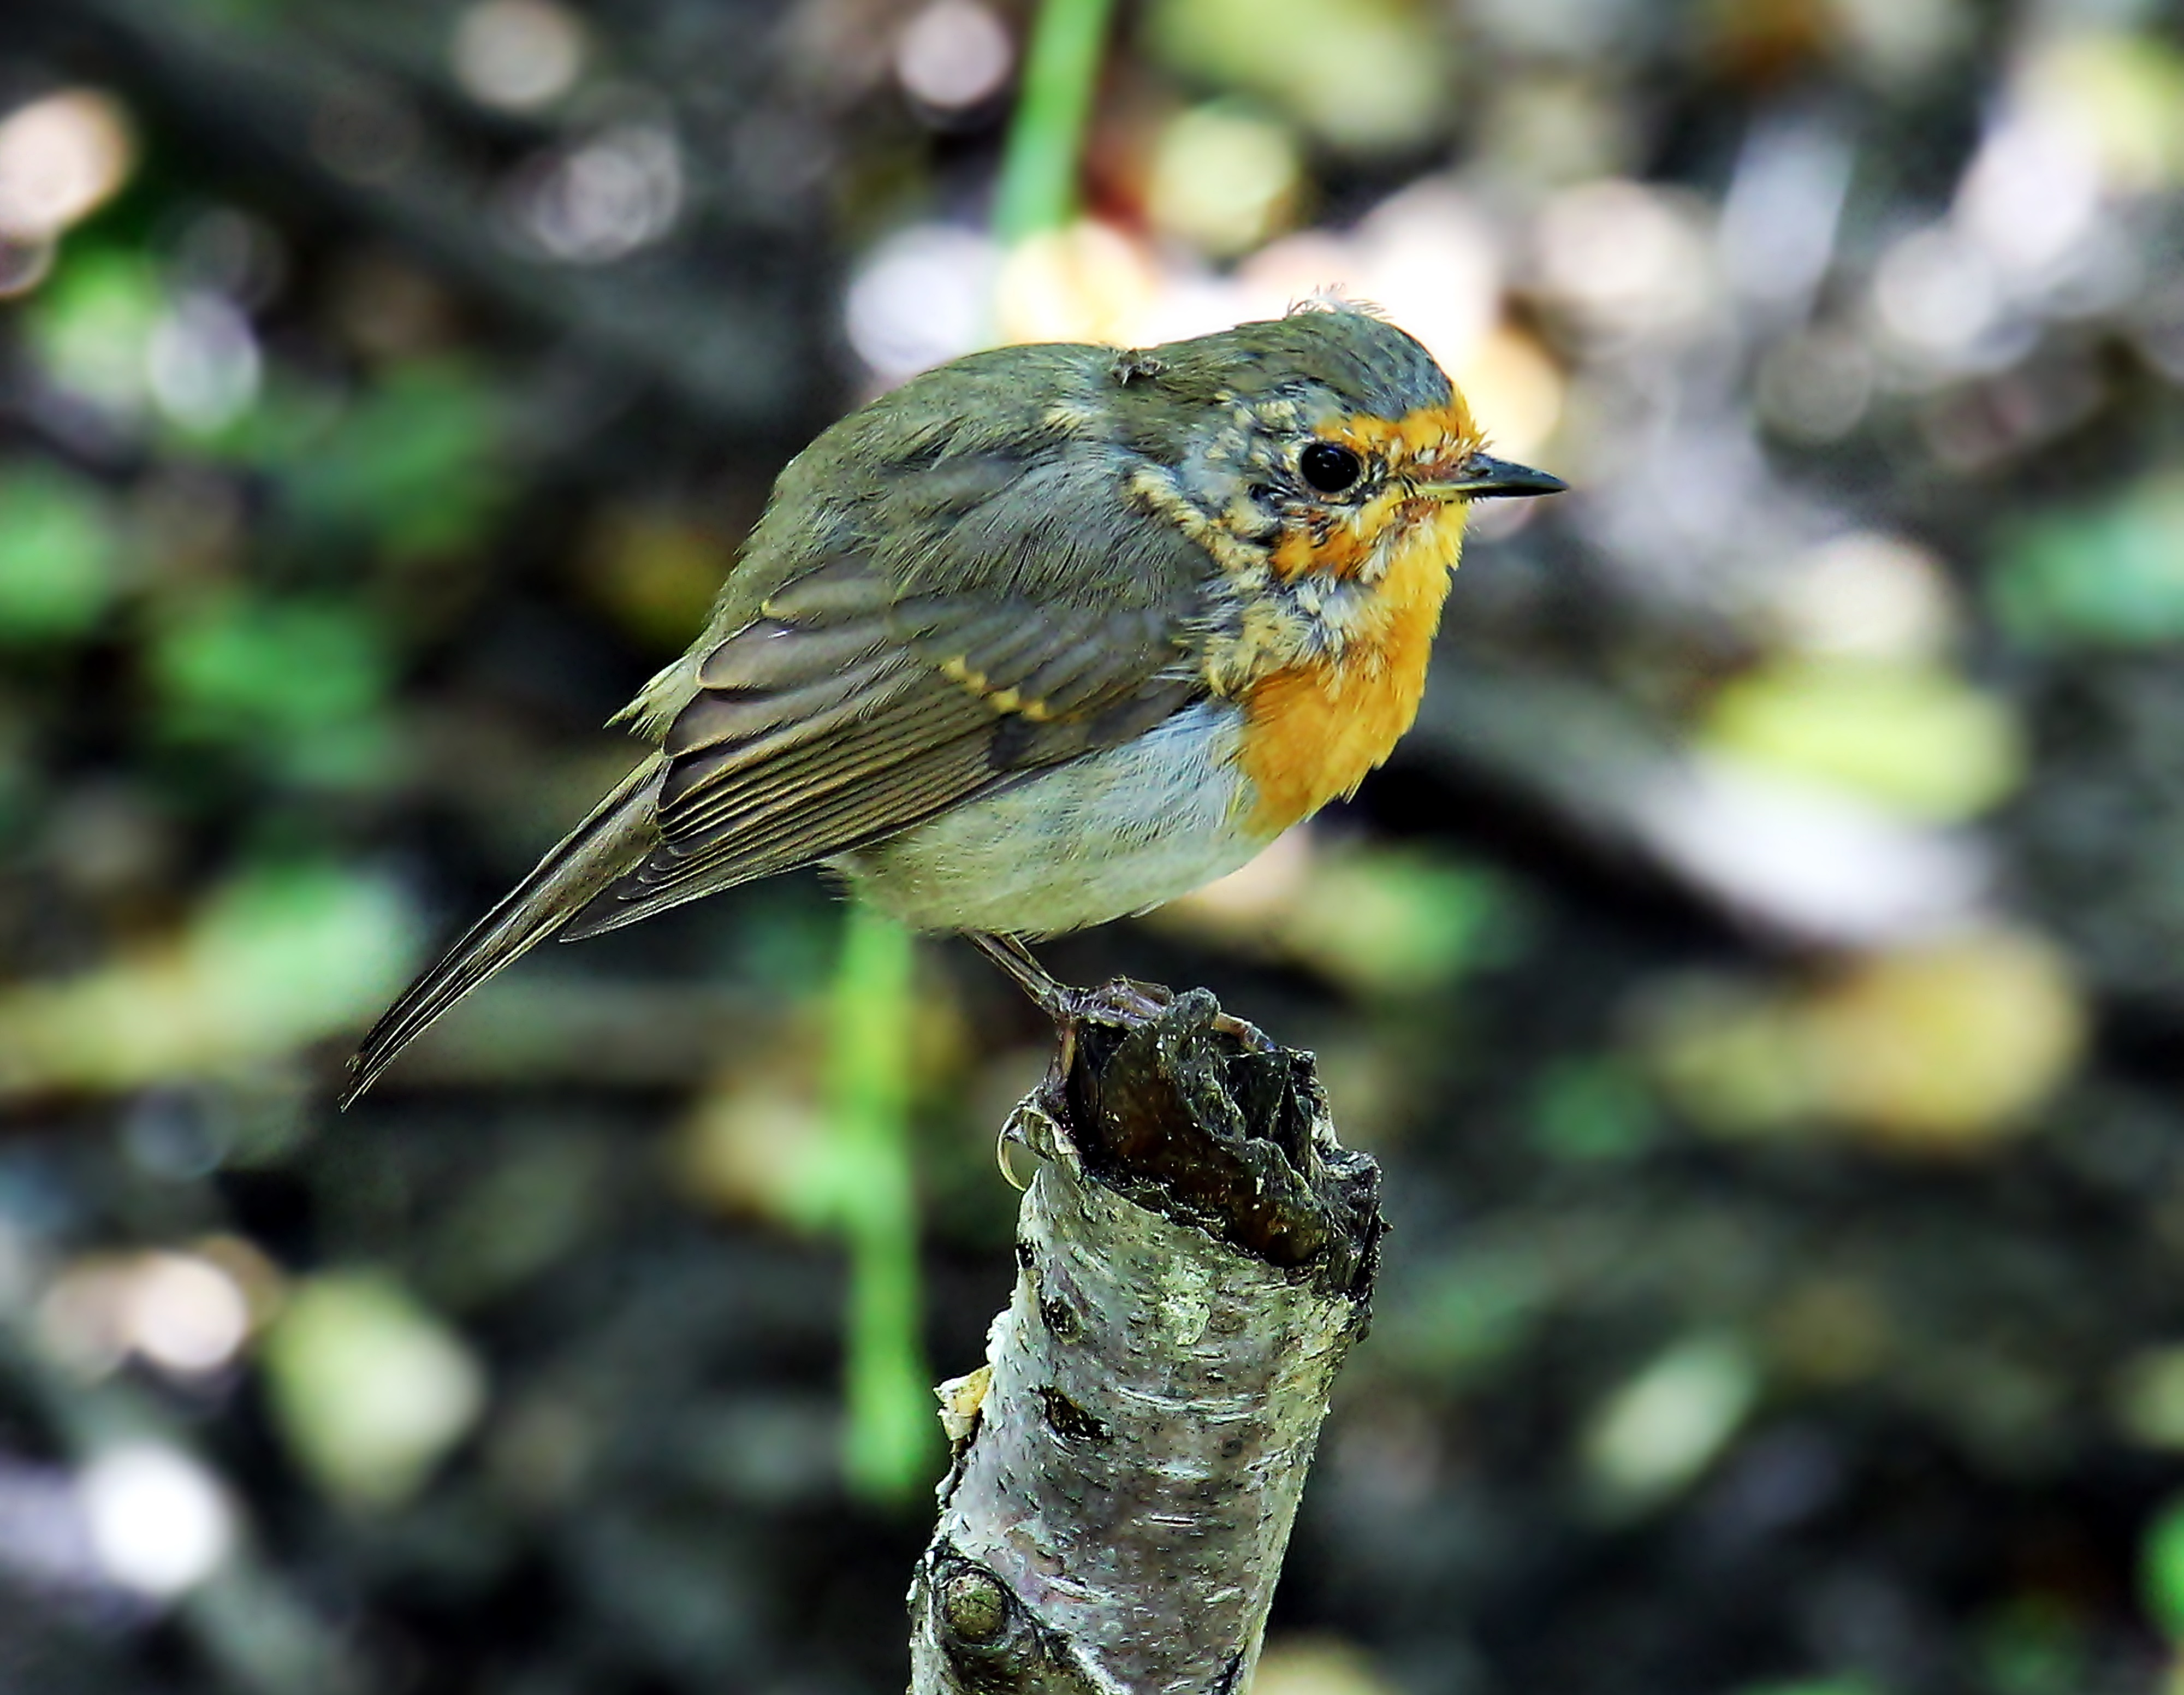 Bird on the broken branch photo